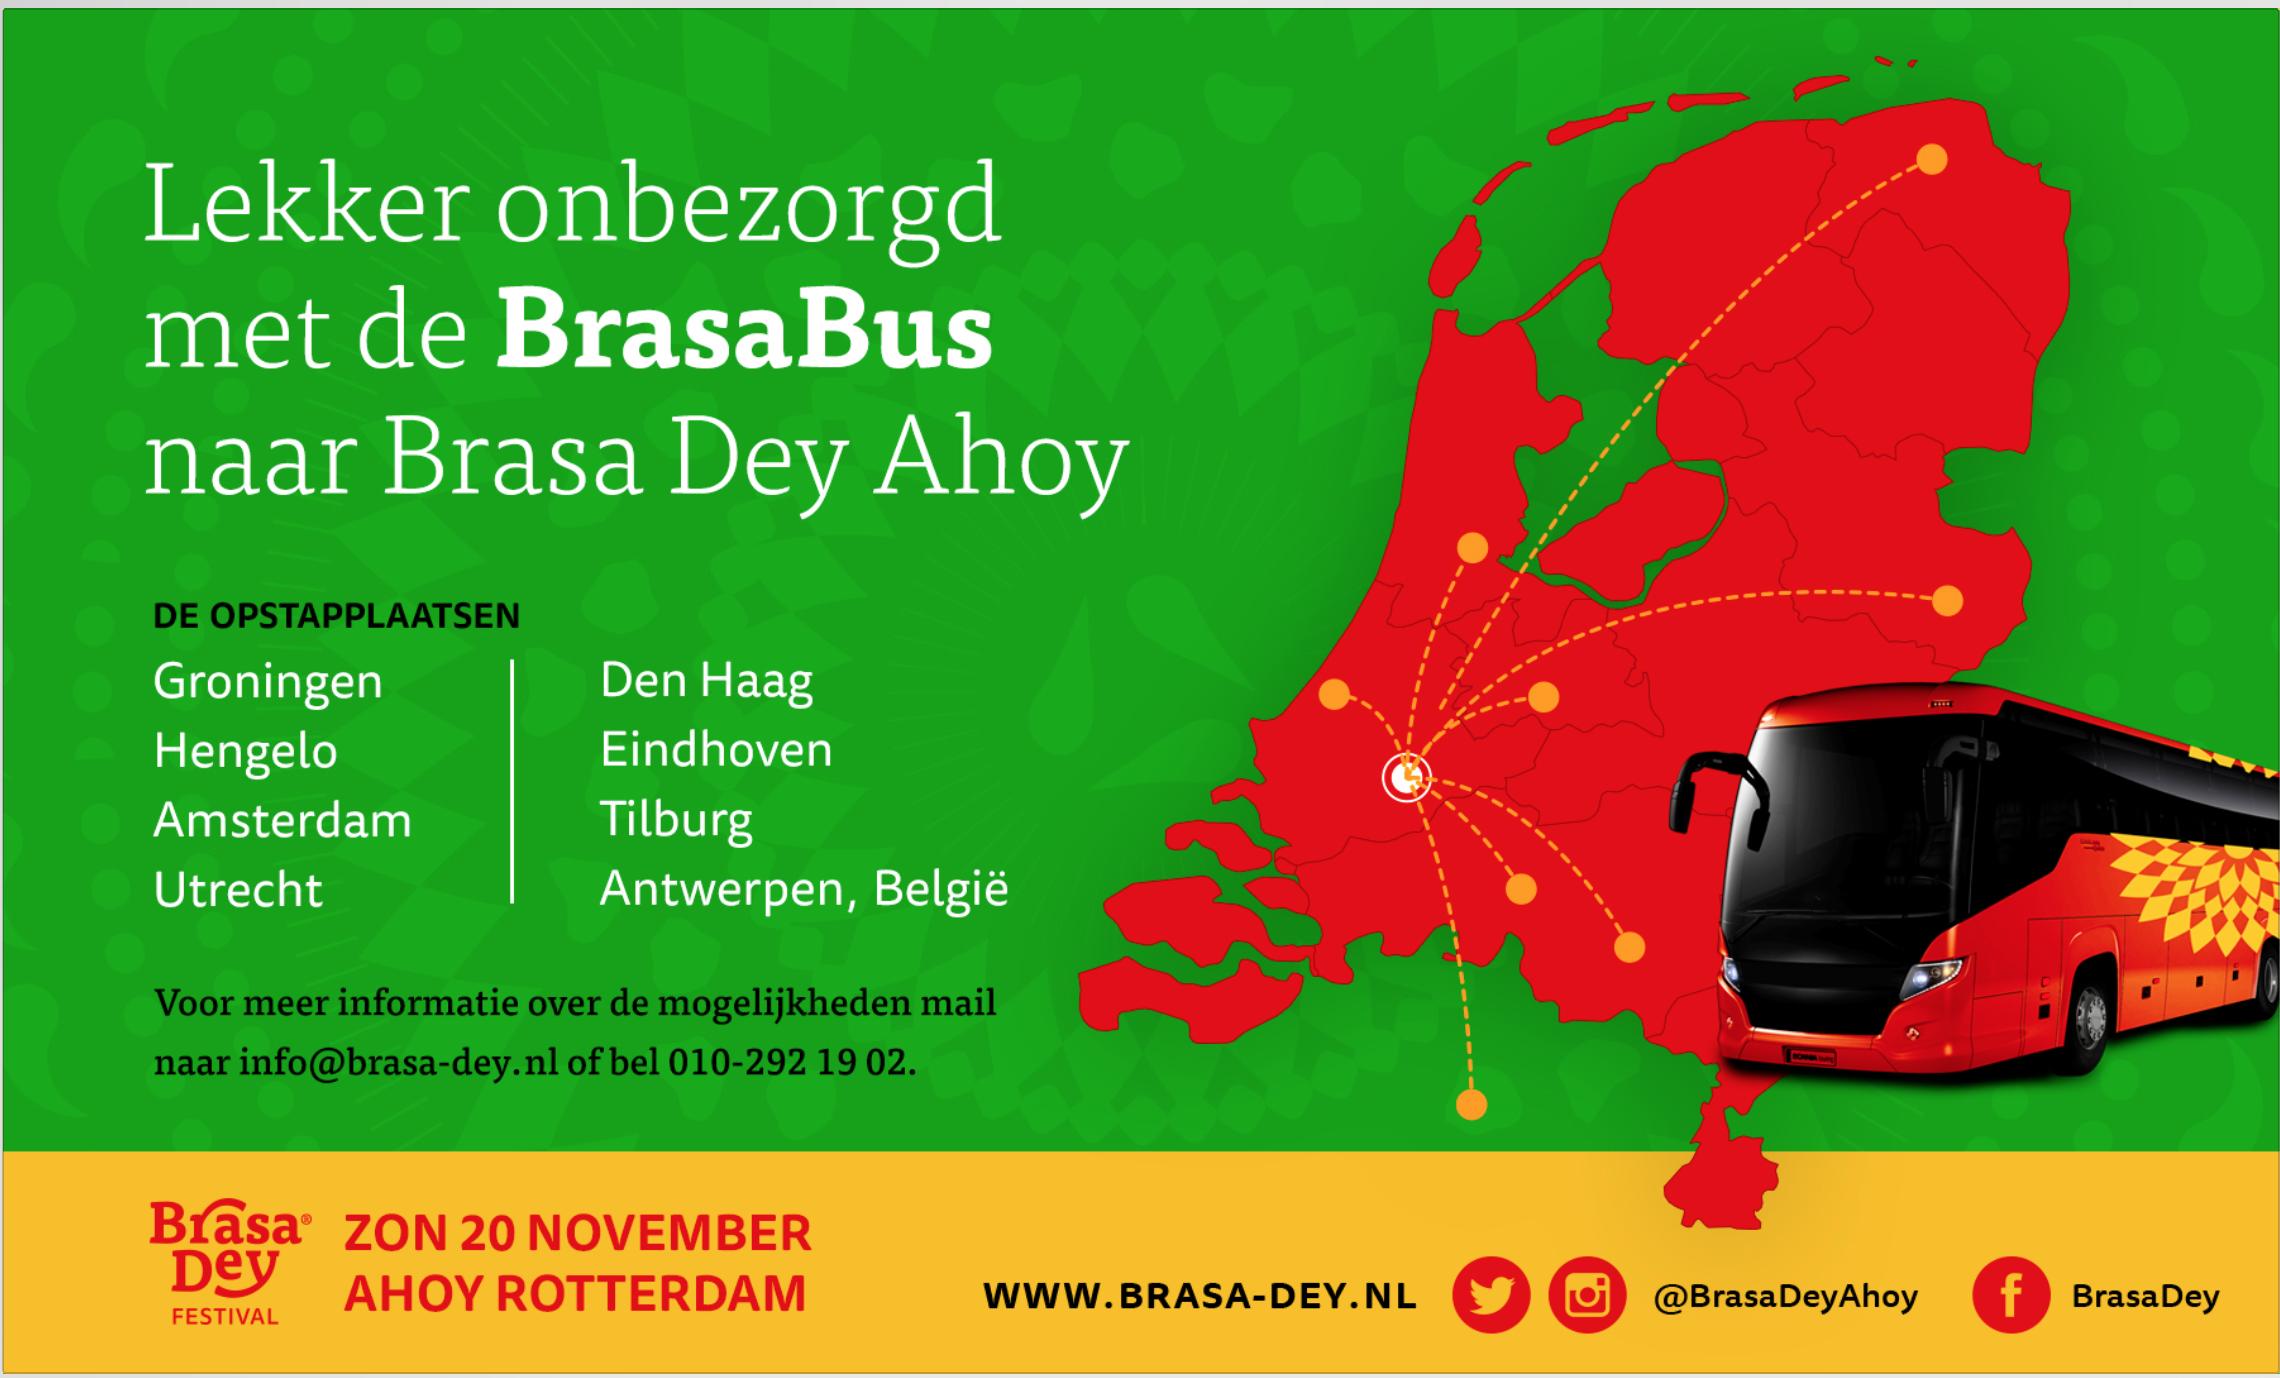 http://brasa-dey.nl/wp-content/uploads/2015/12/1478540164.png